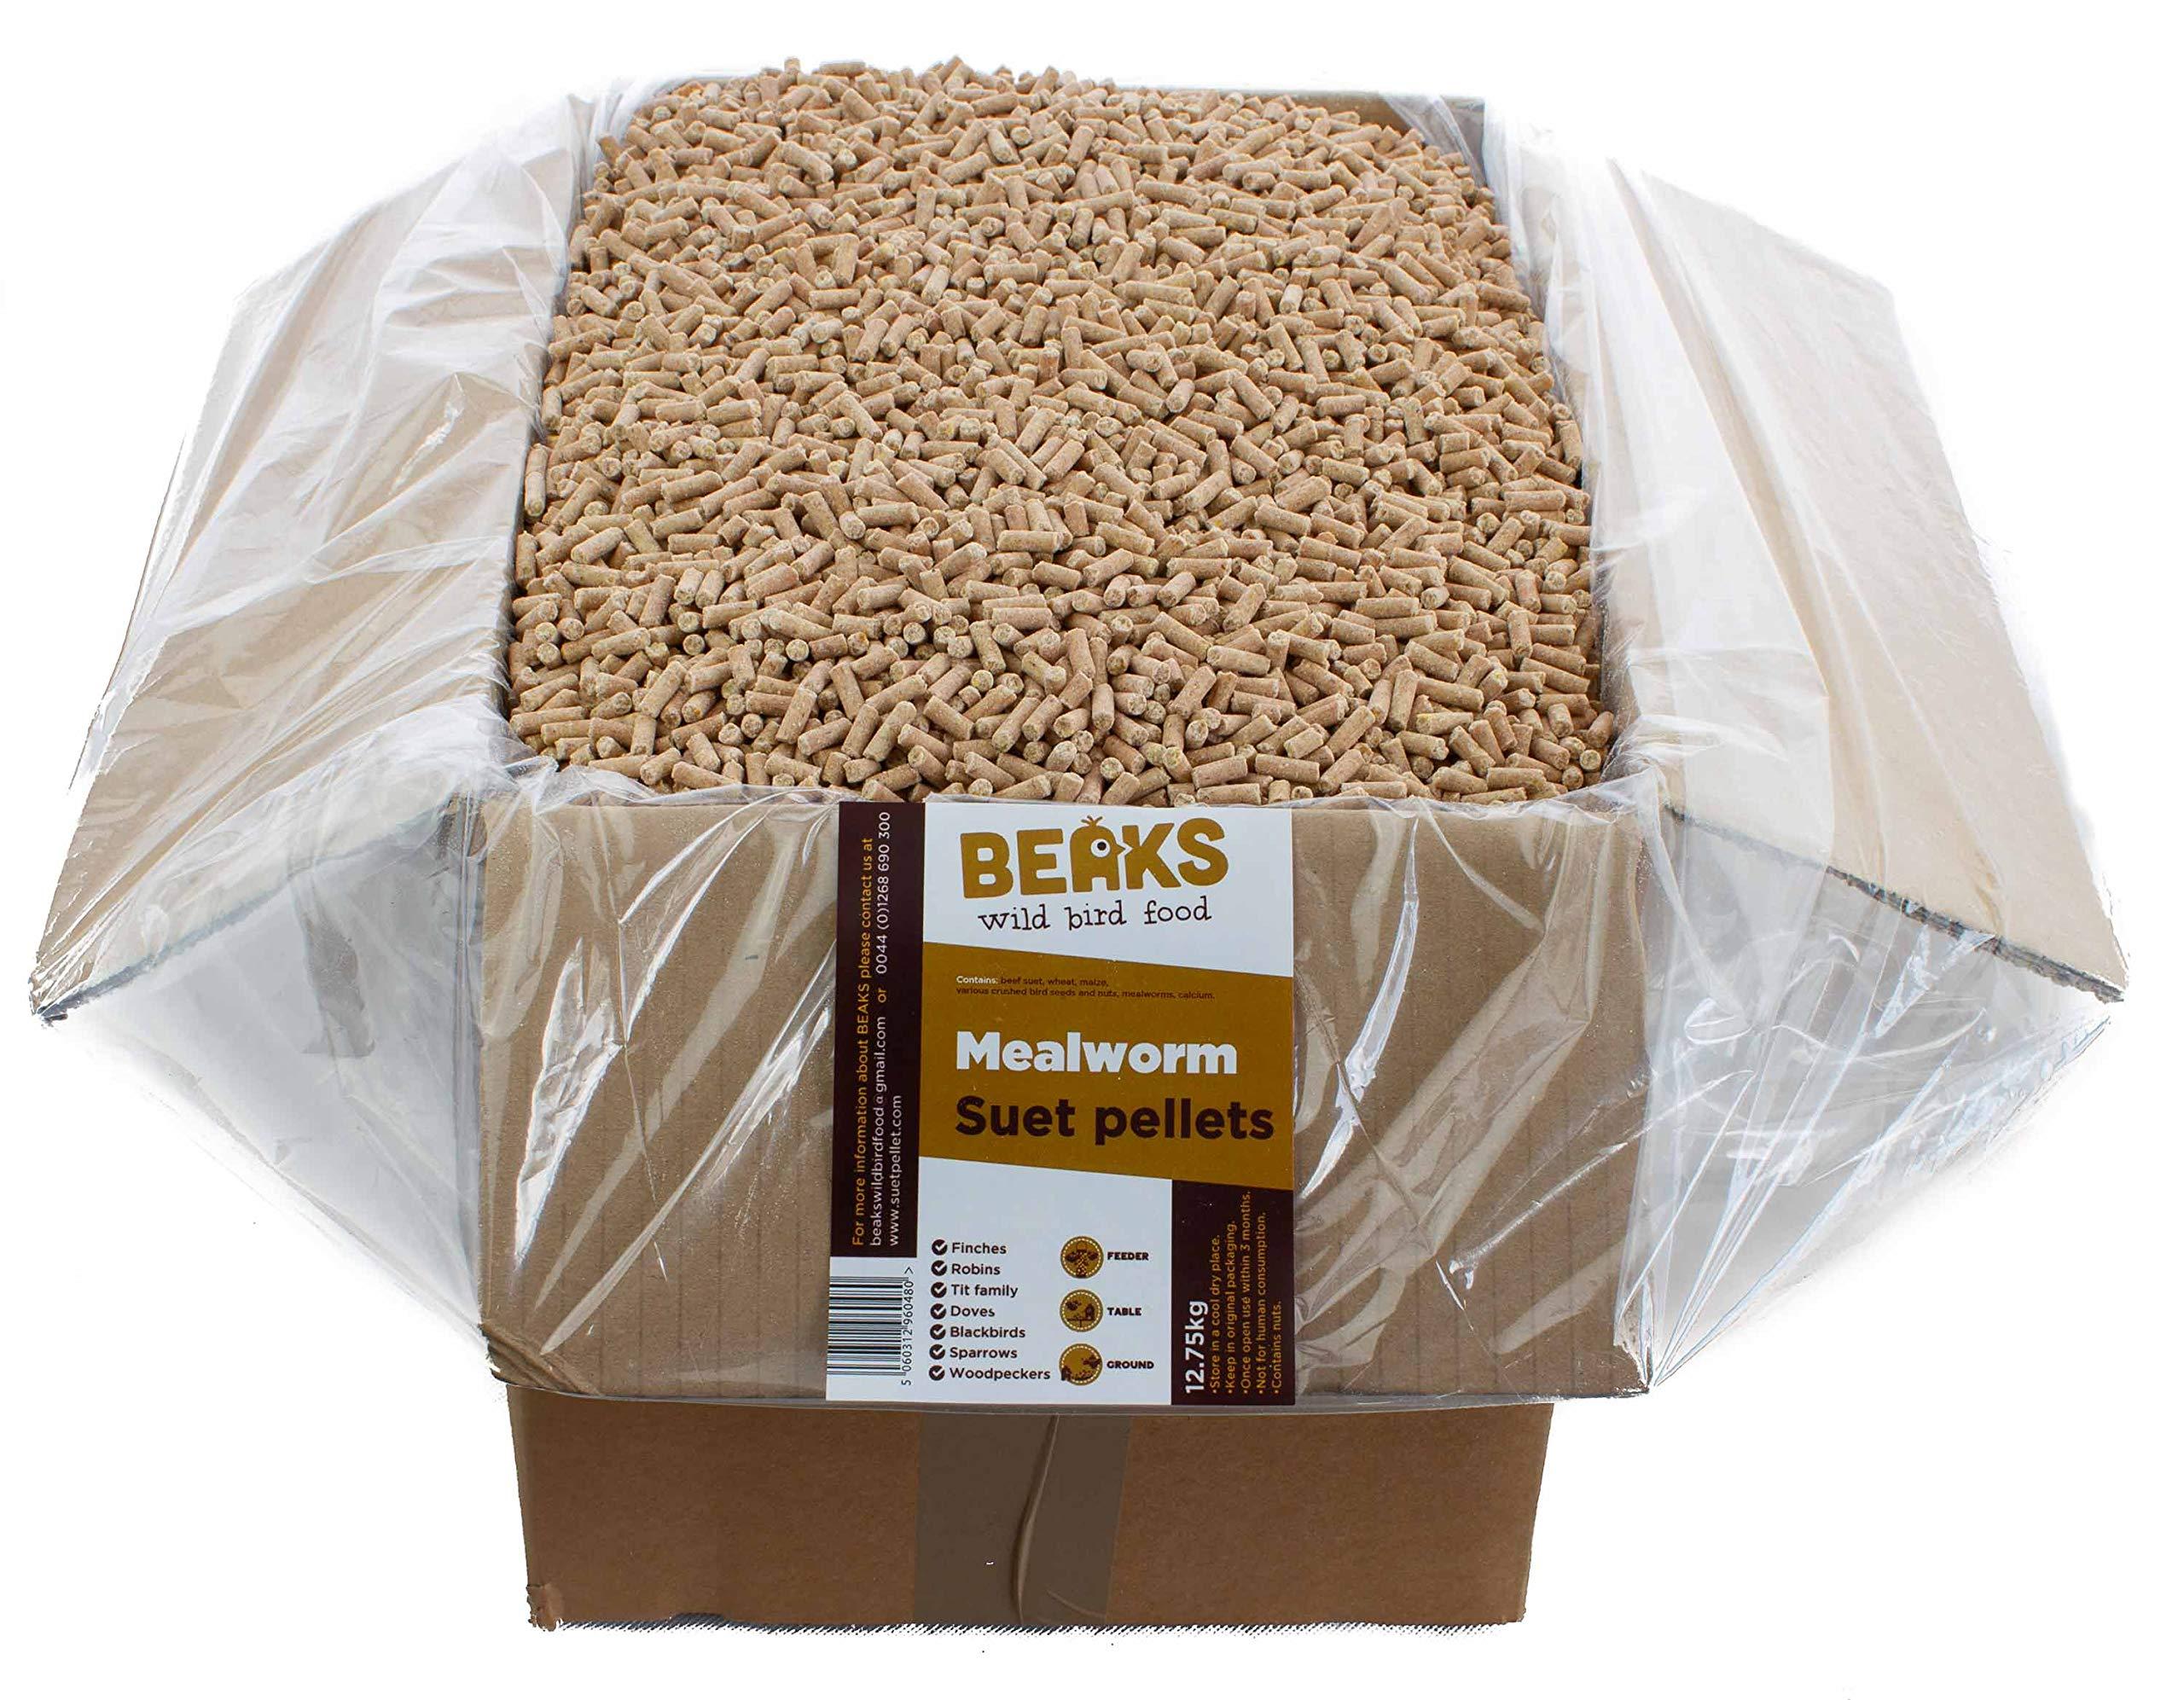 BEAKS wild bird food Mealworm Suet Pellets 12.75kg Box free p&p